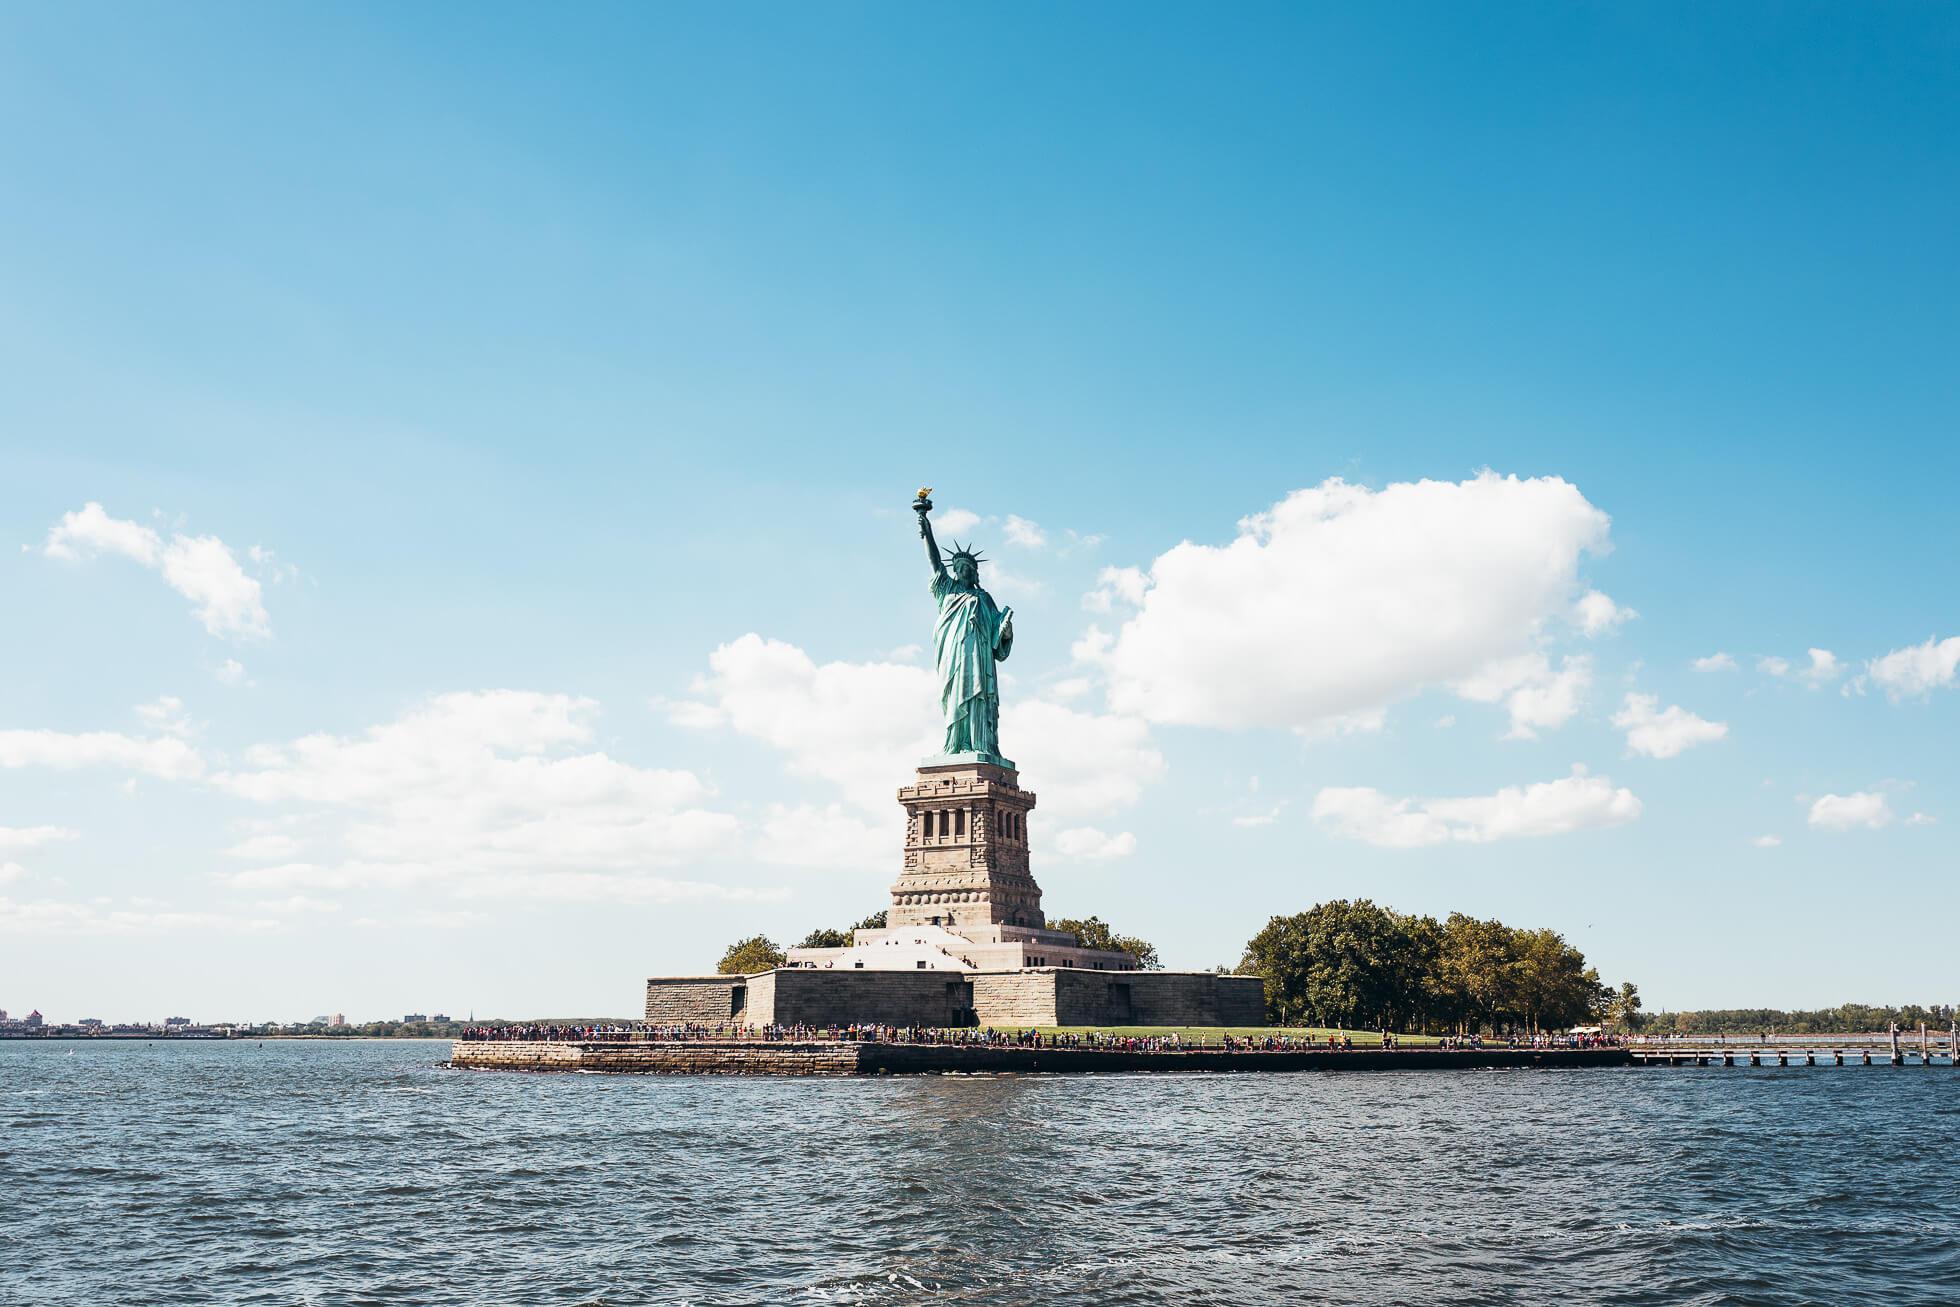 janni-deler-new-york-tour-boatL1090427